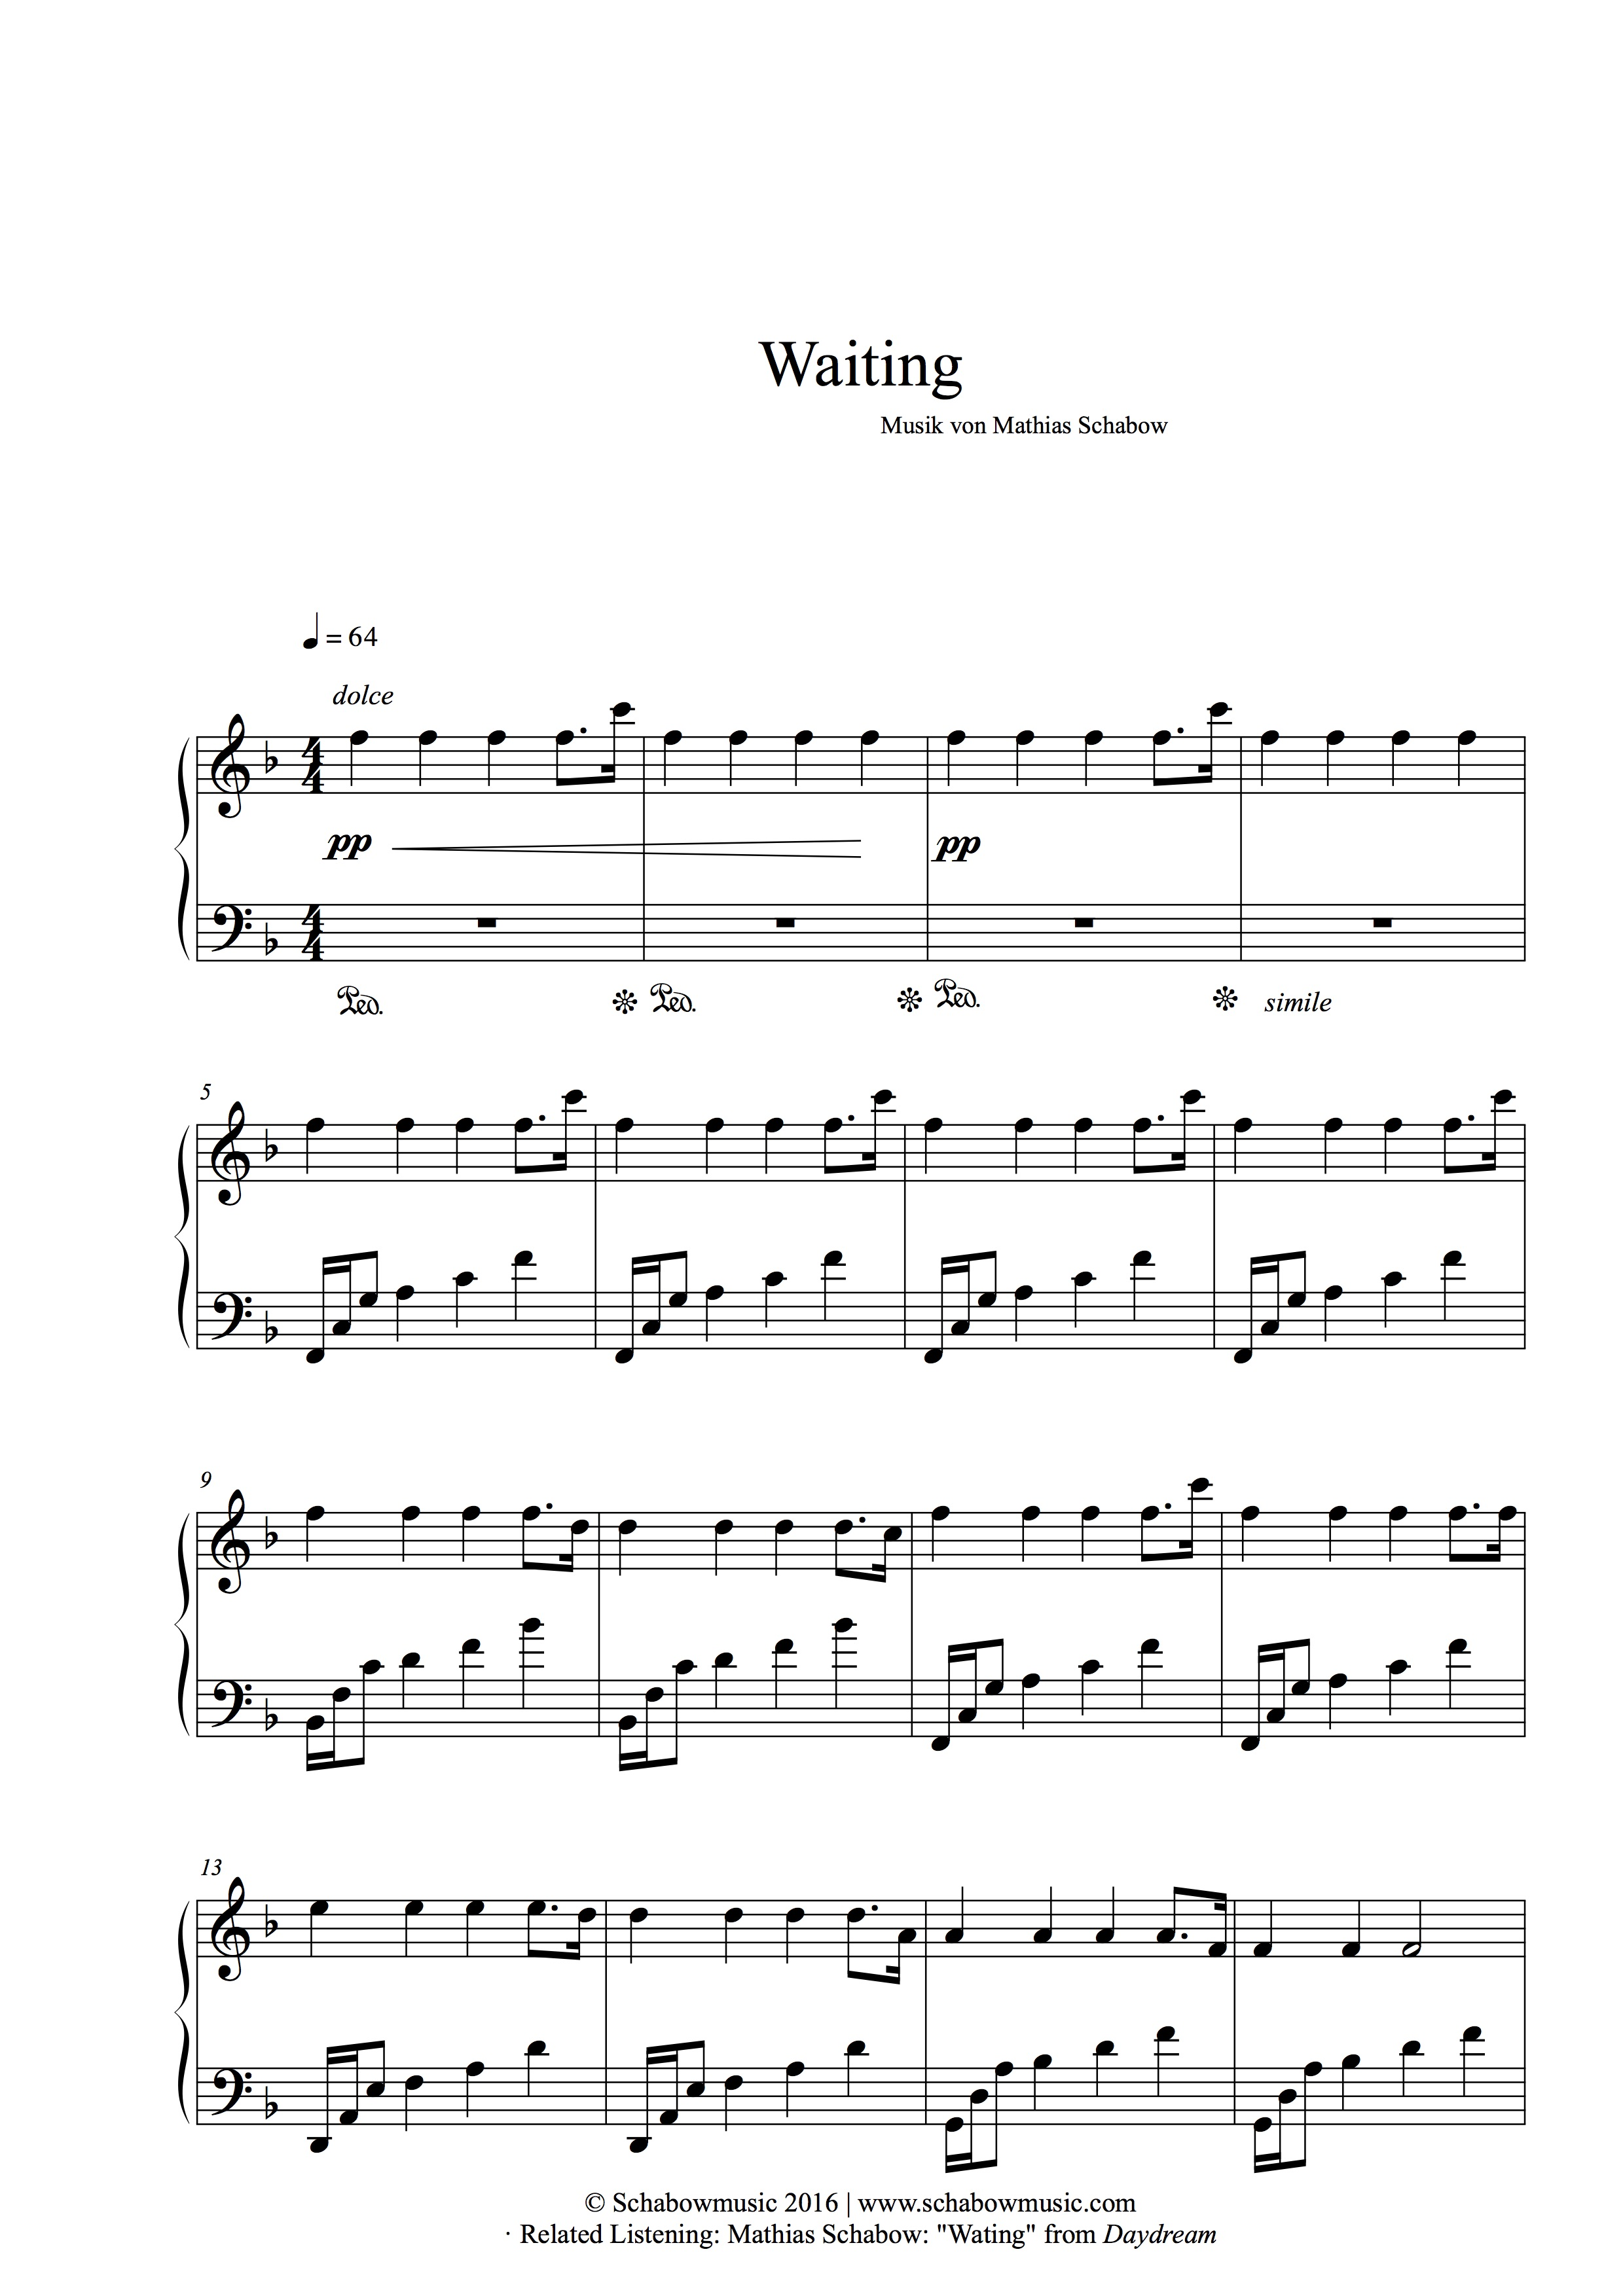 Waiting - Mathias Schabow | Piano